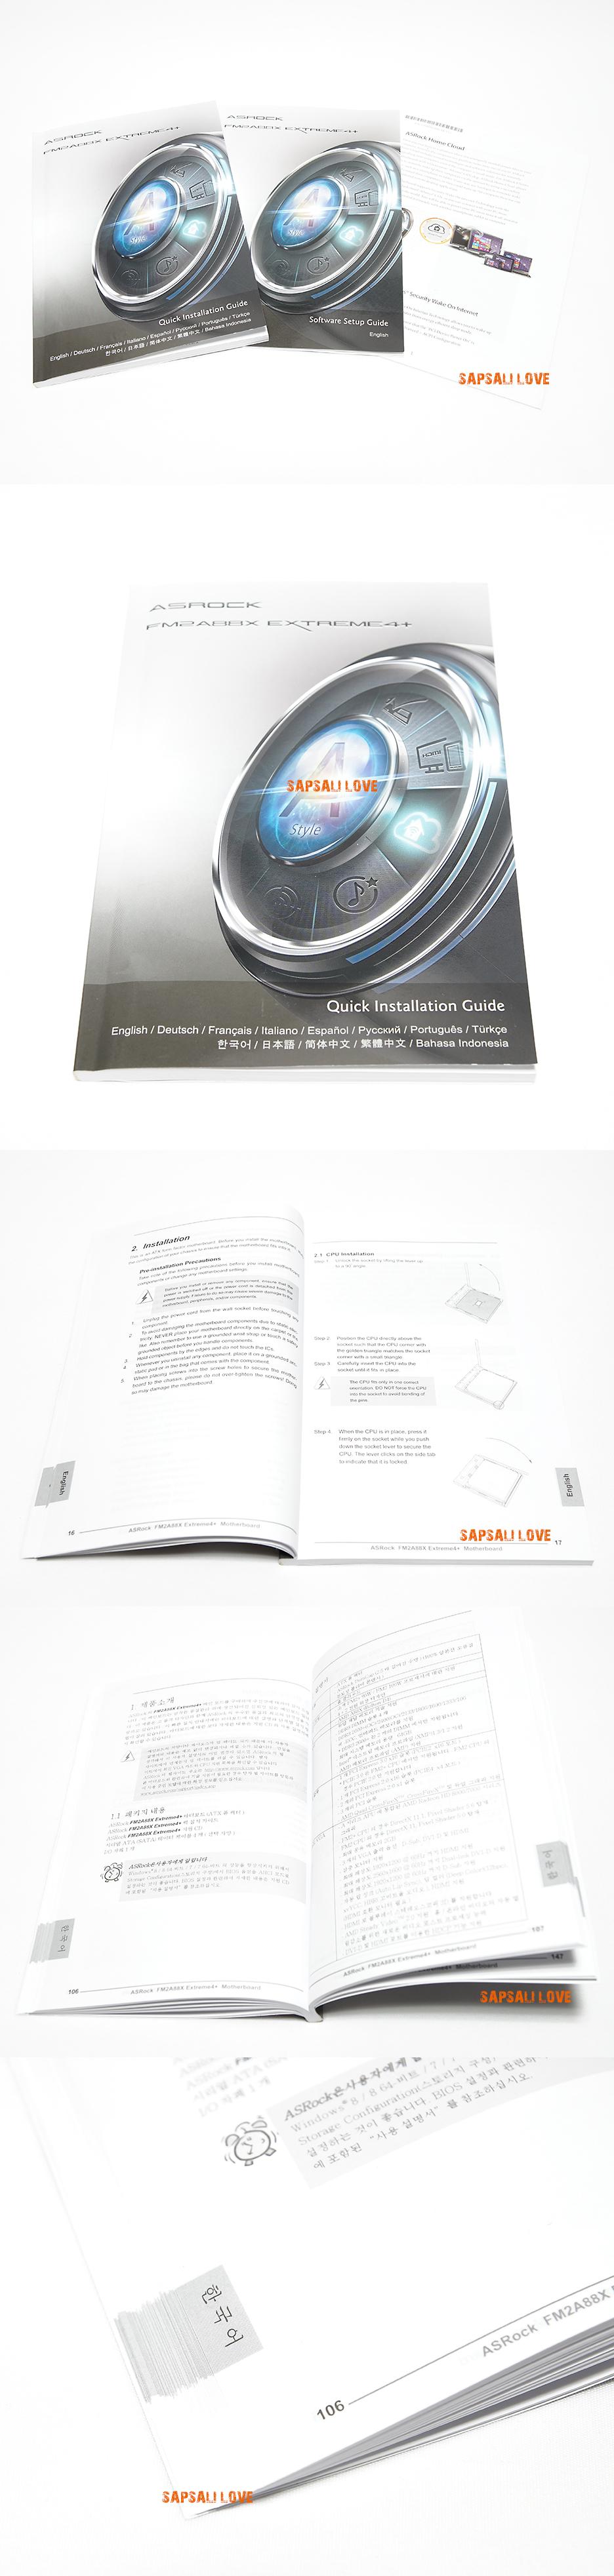 FM2A88X-Extreme4+-패키지13.jpg